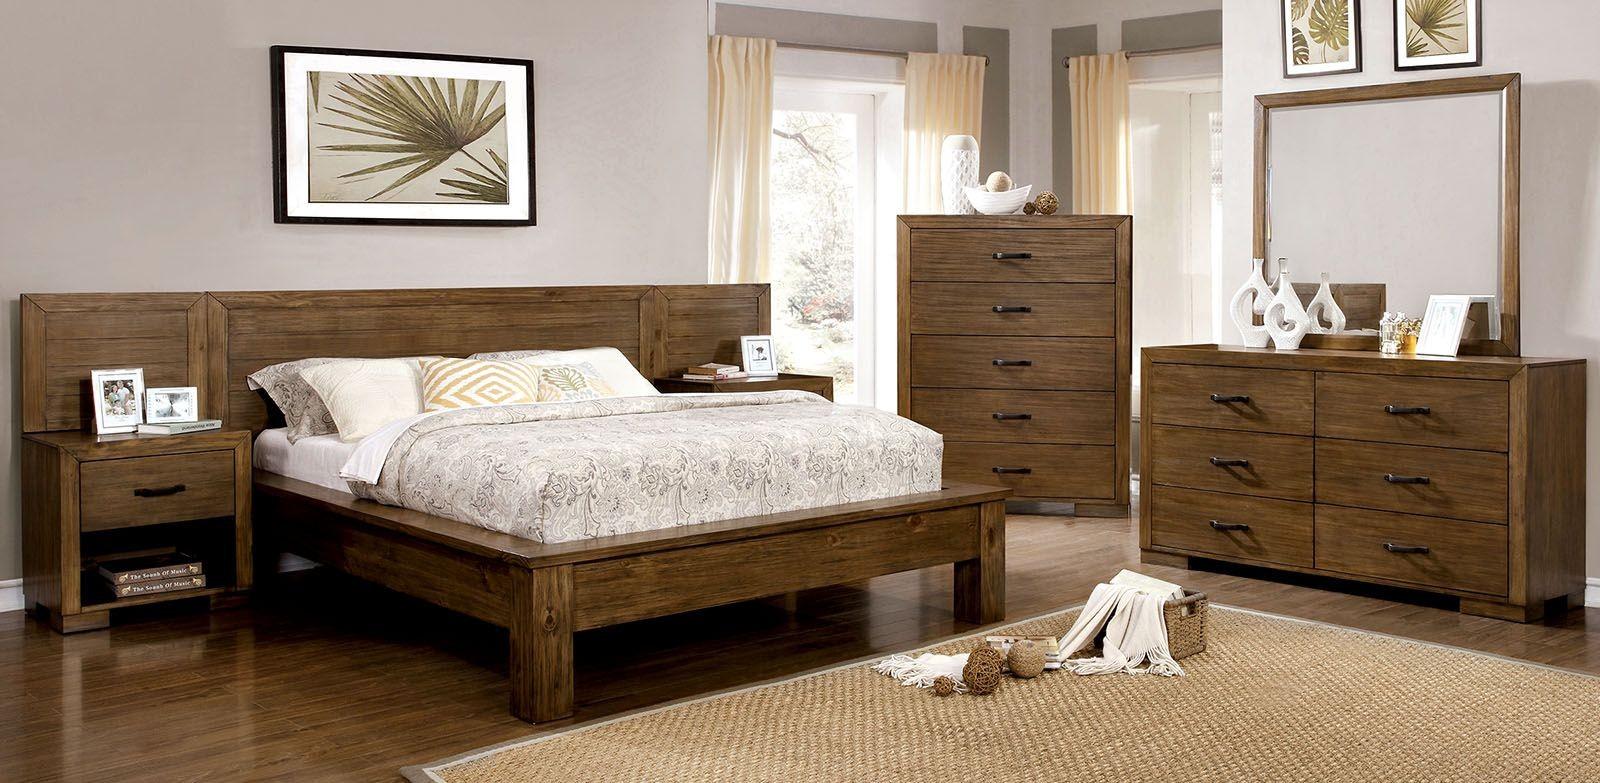 Bairro Reclaimed Pine Wood Bedroom Set from Furniture of